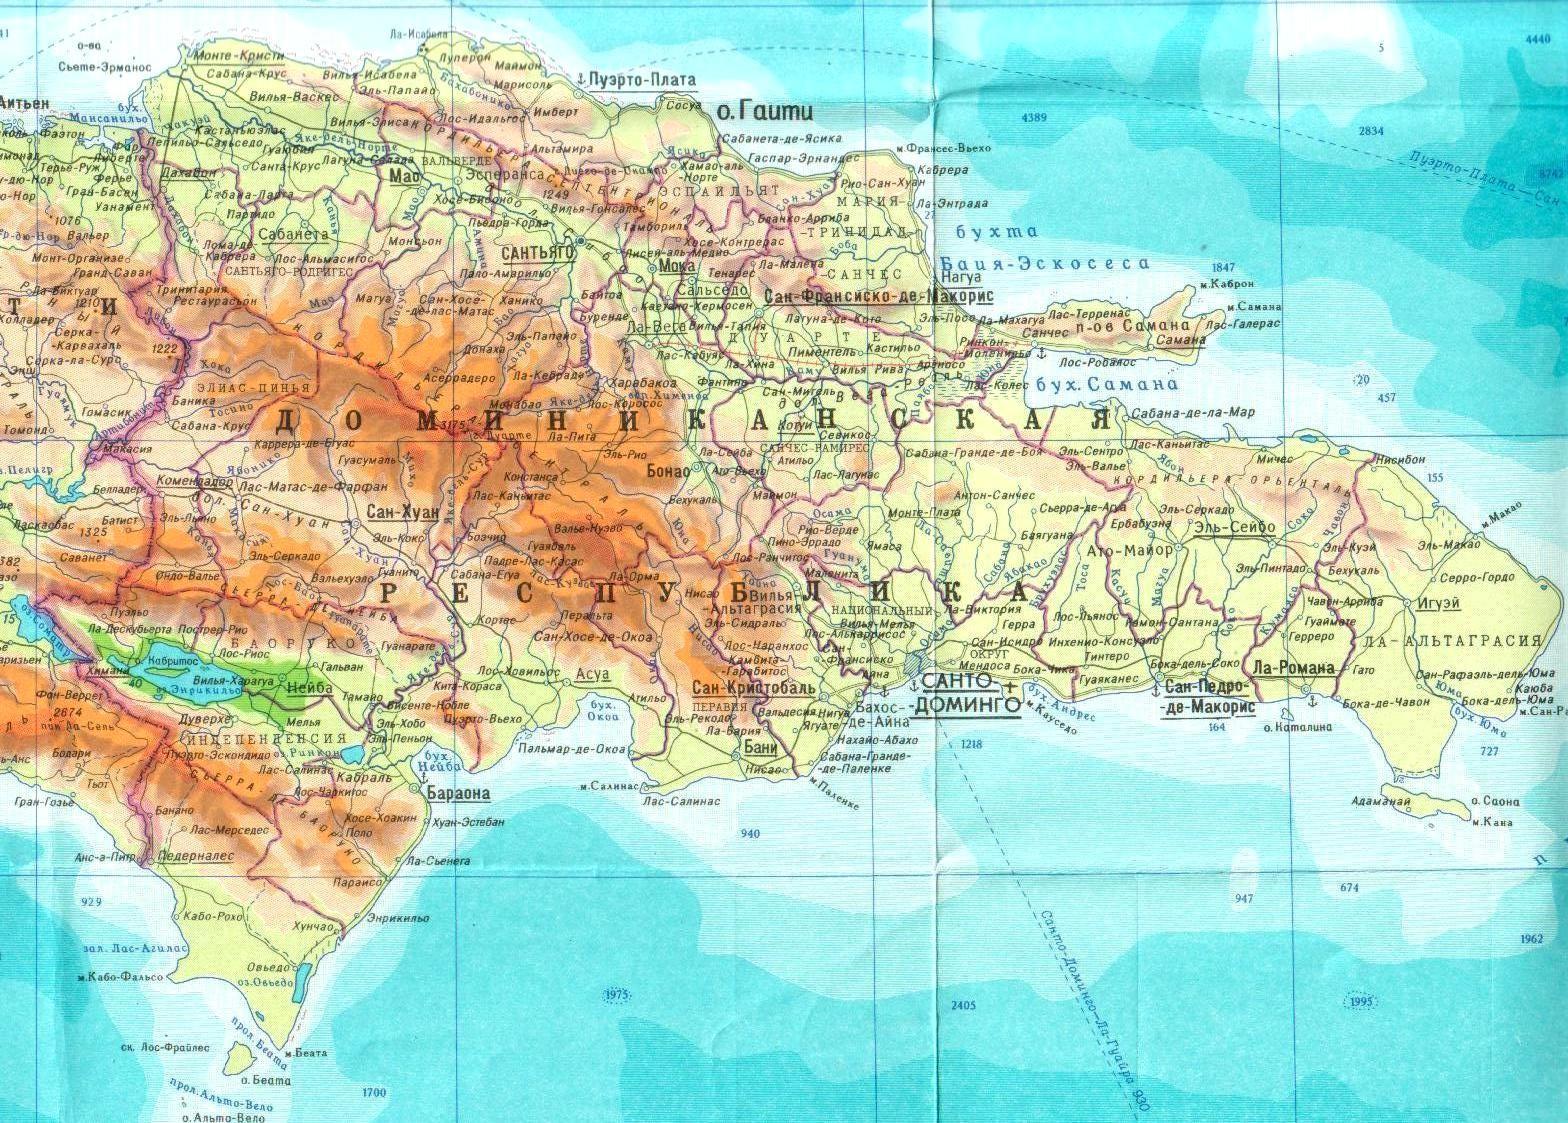 доминикана где находится на карте мира фото характере